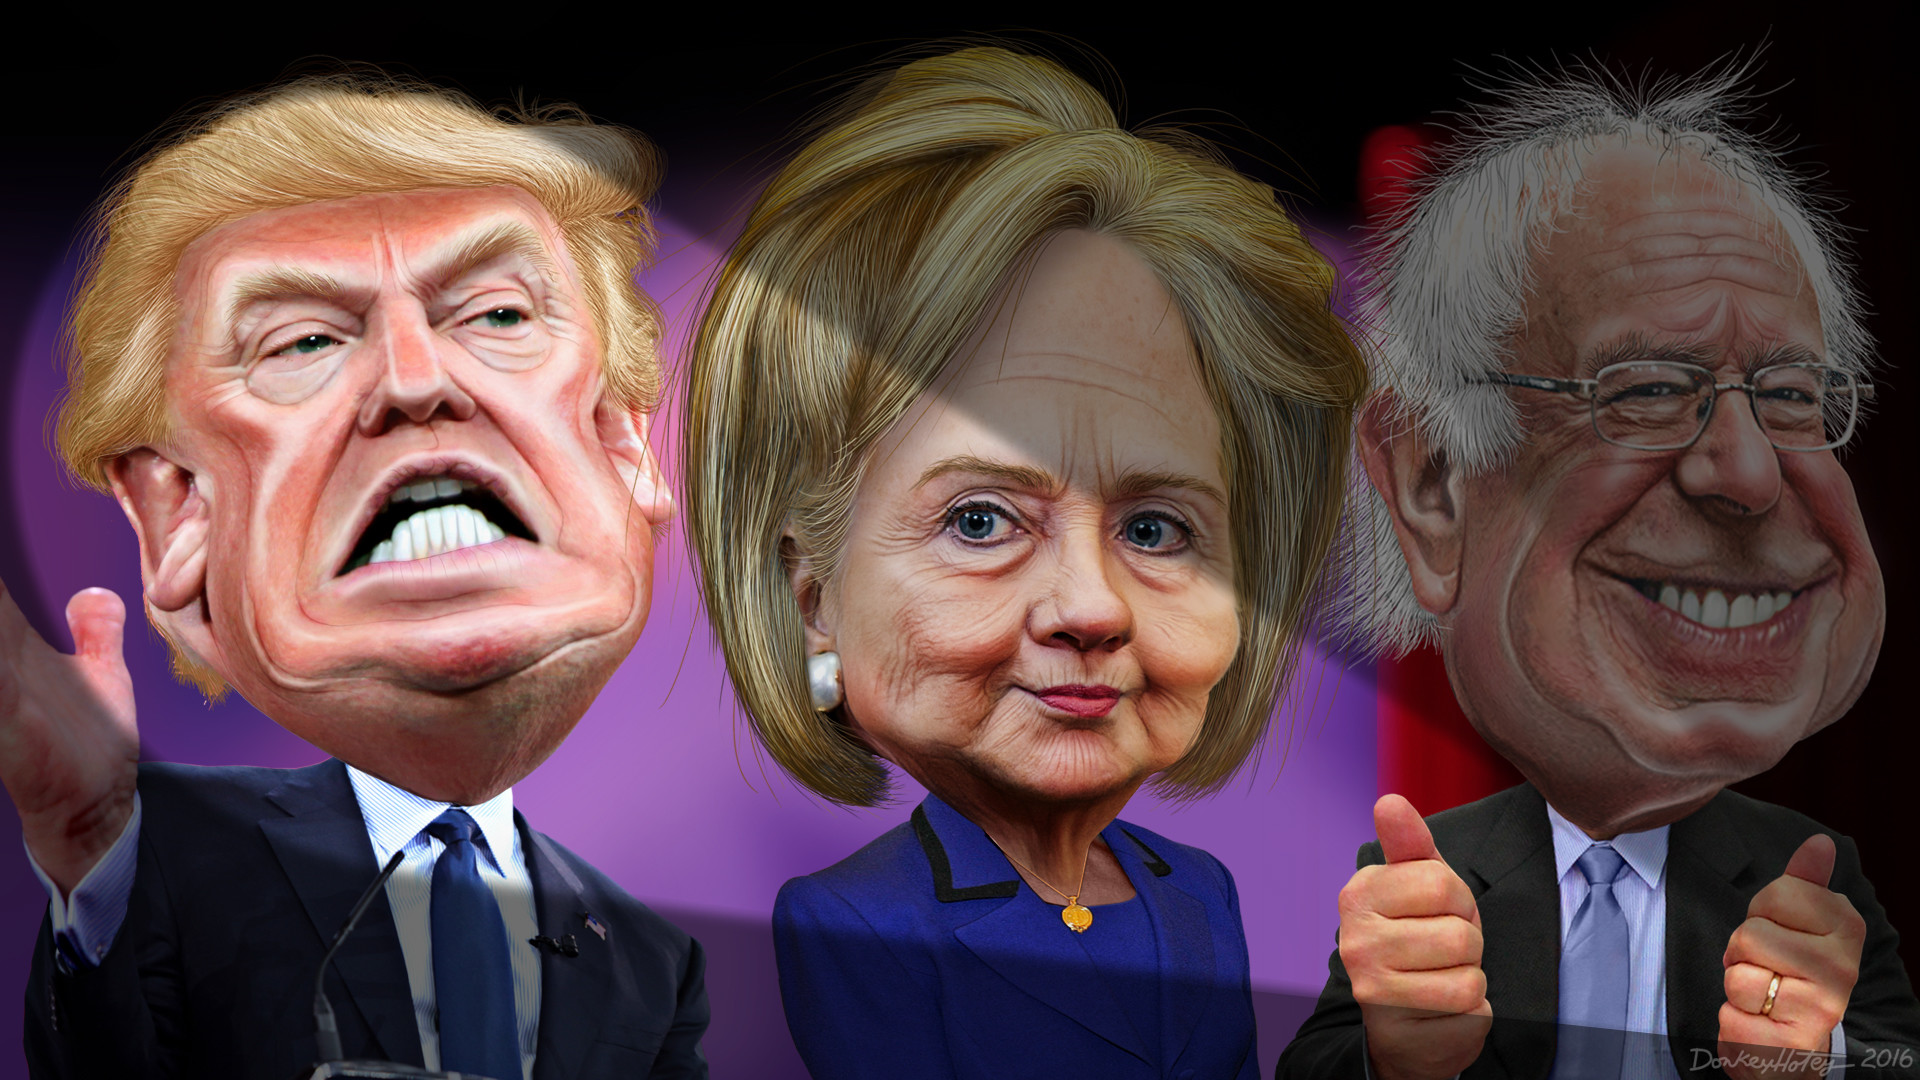 File:MSM spotlights Donald Trump vs. Hillary Clinton and Bernie Sanders  (24311159914)